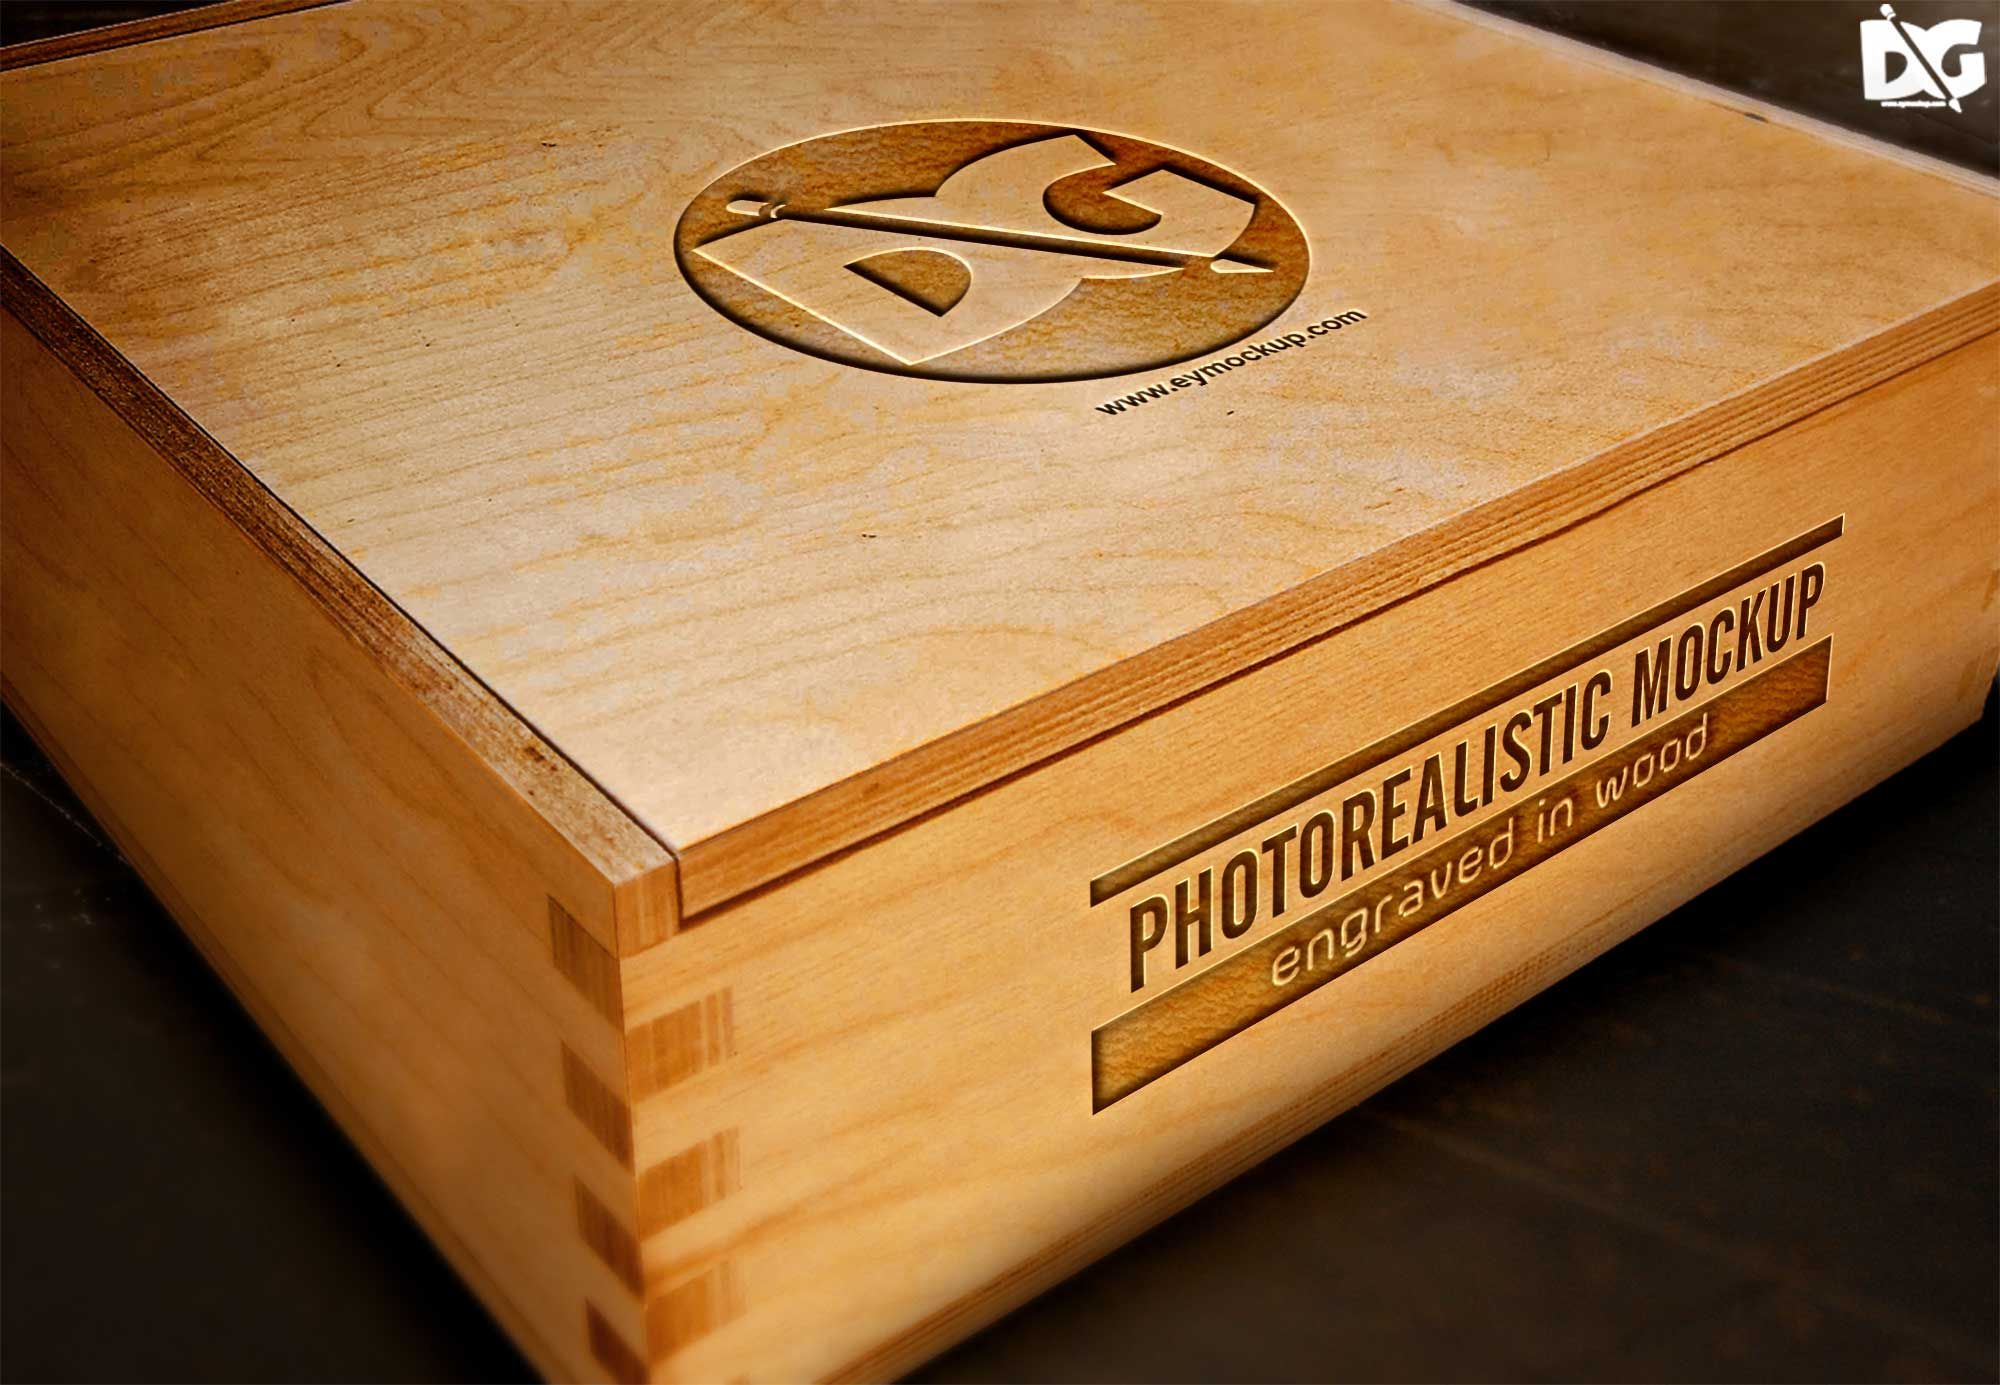 Download Engraved Wood Box Logo Mockup Logo Mockup Free Logo Mockup Mockup Free Psd